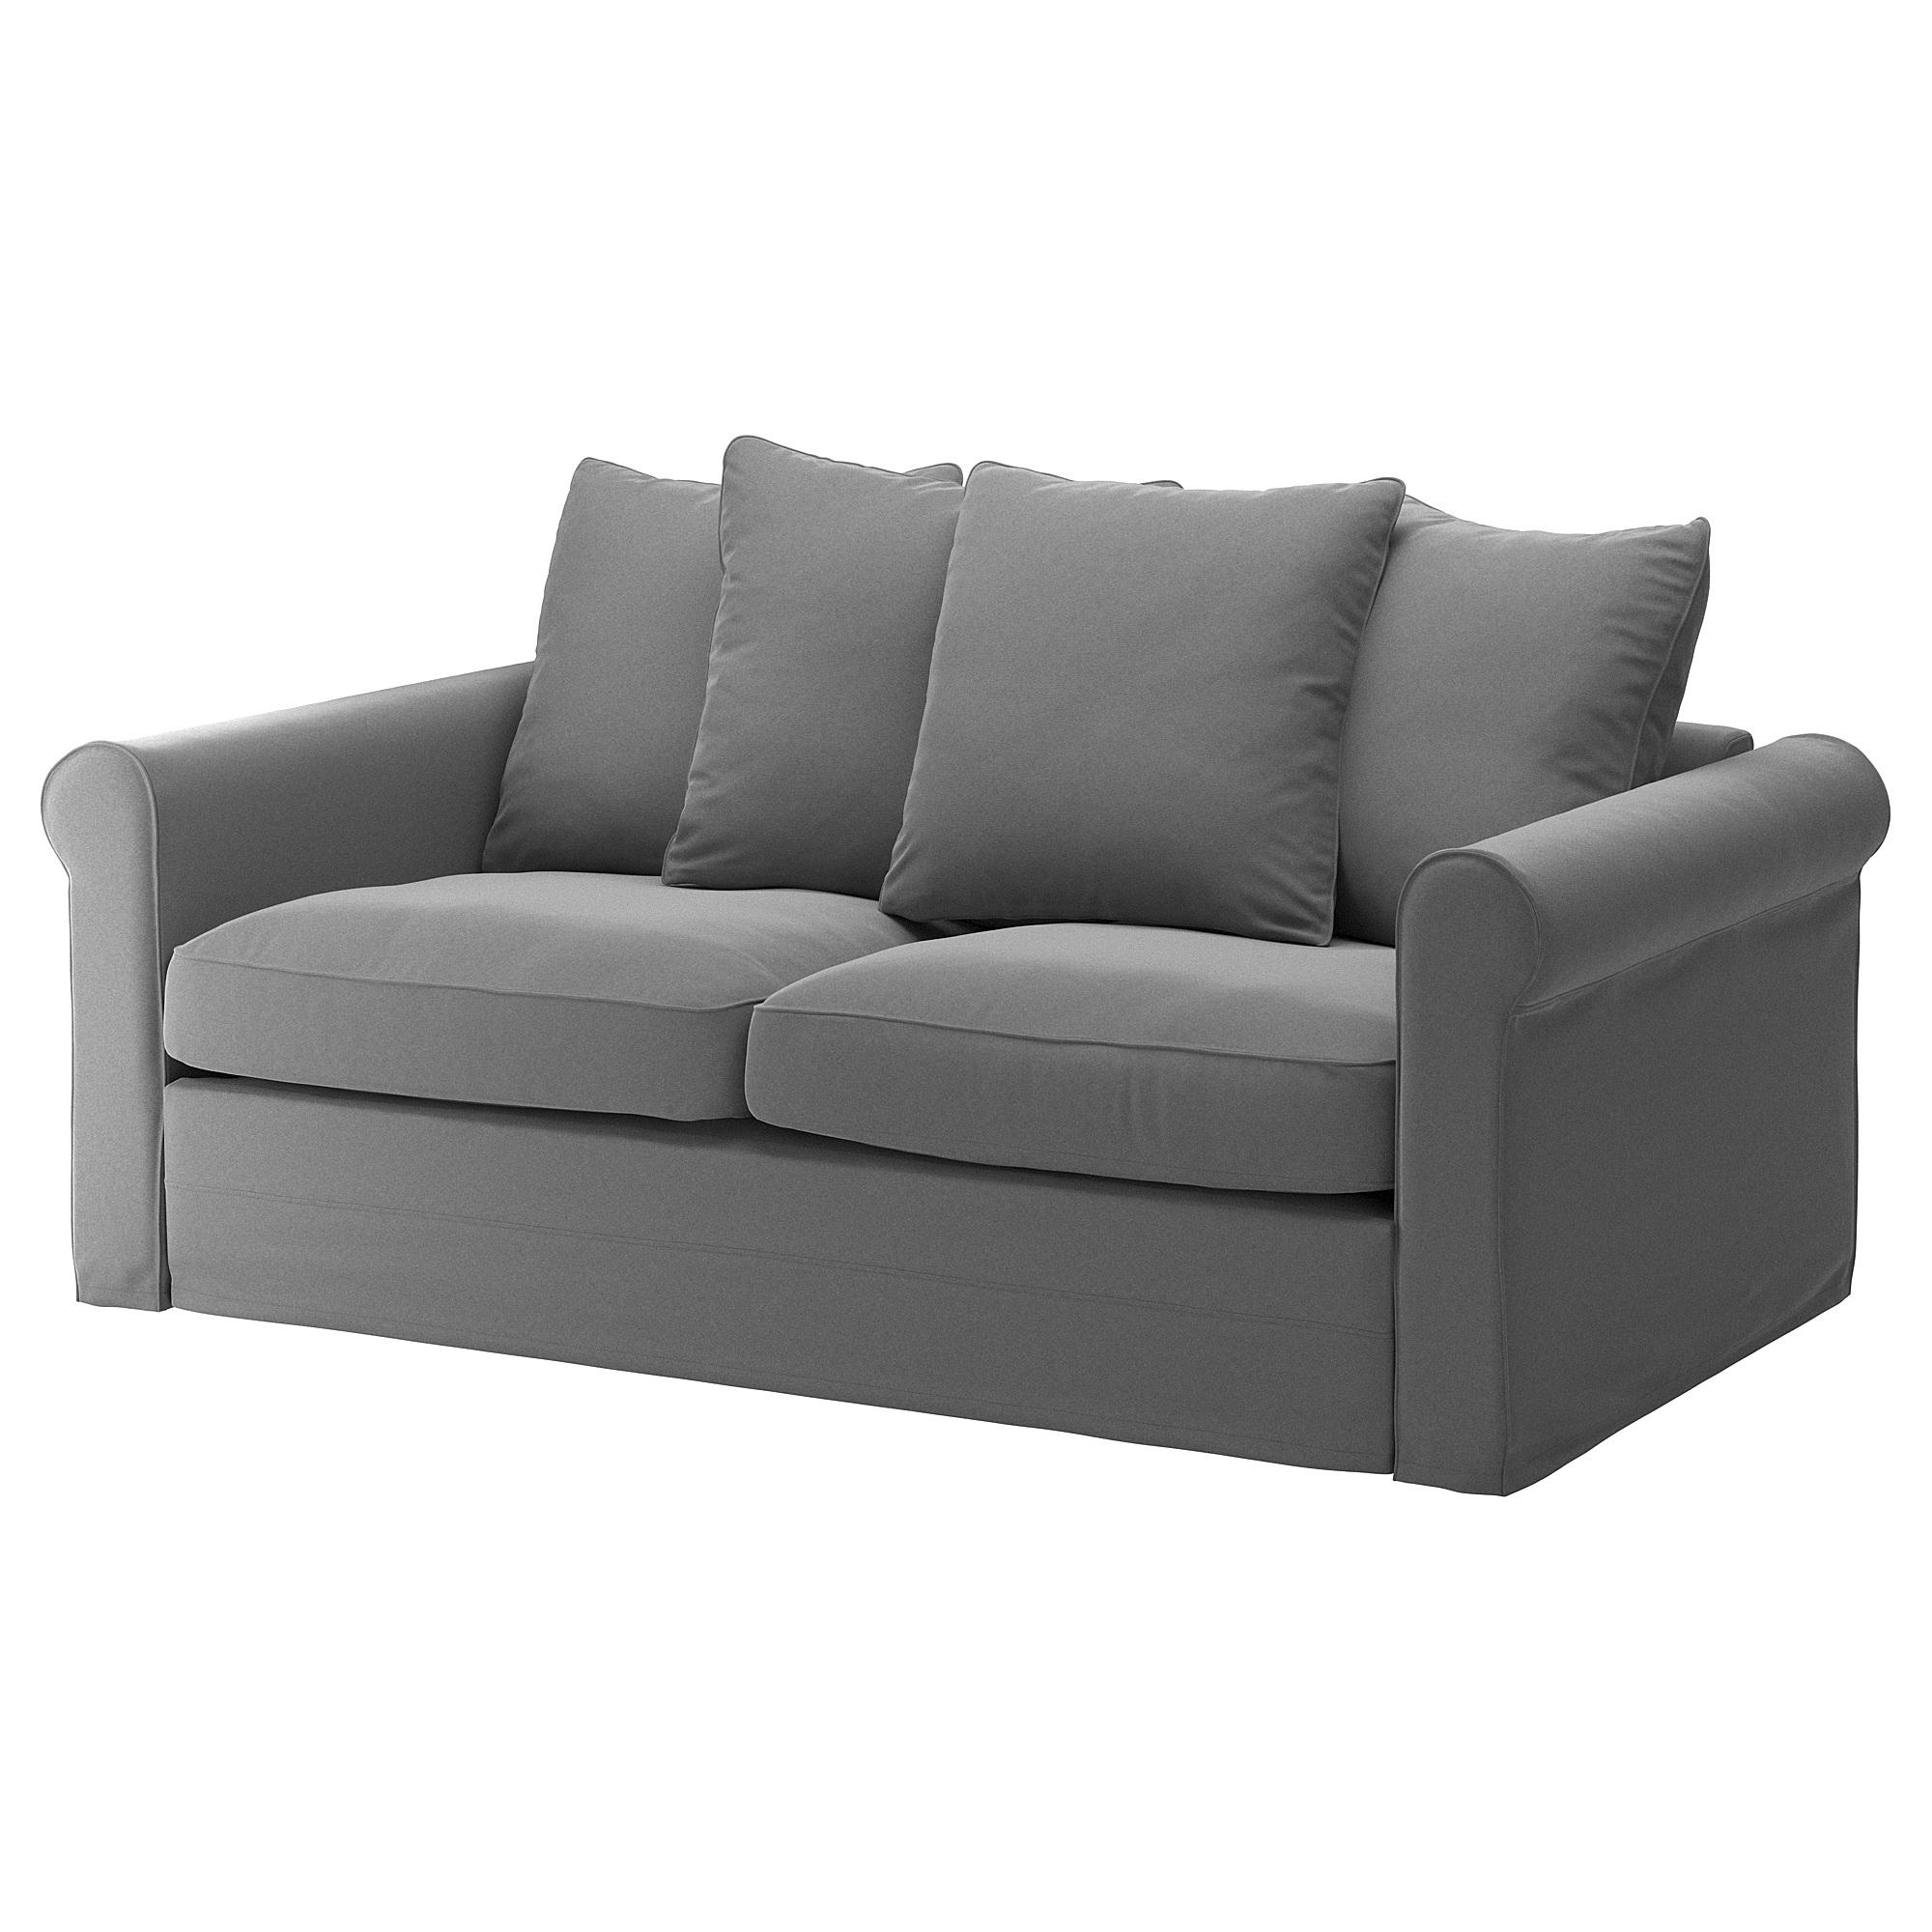 GRÖNLID 2-seat sofa-bed